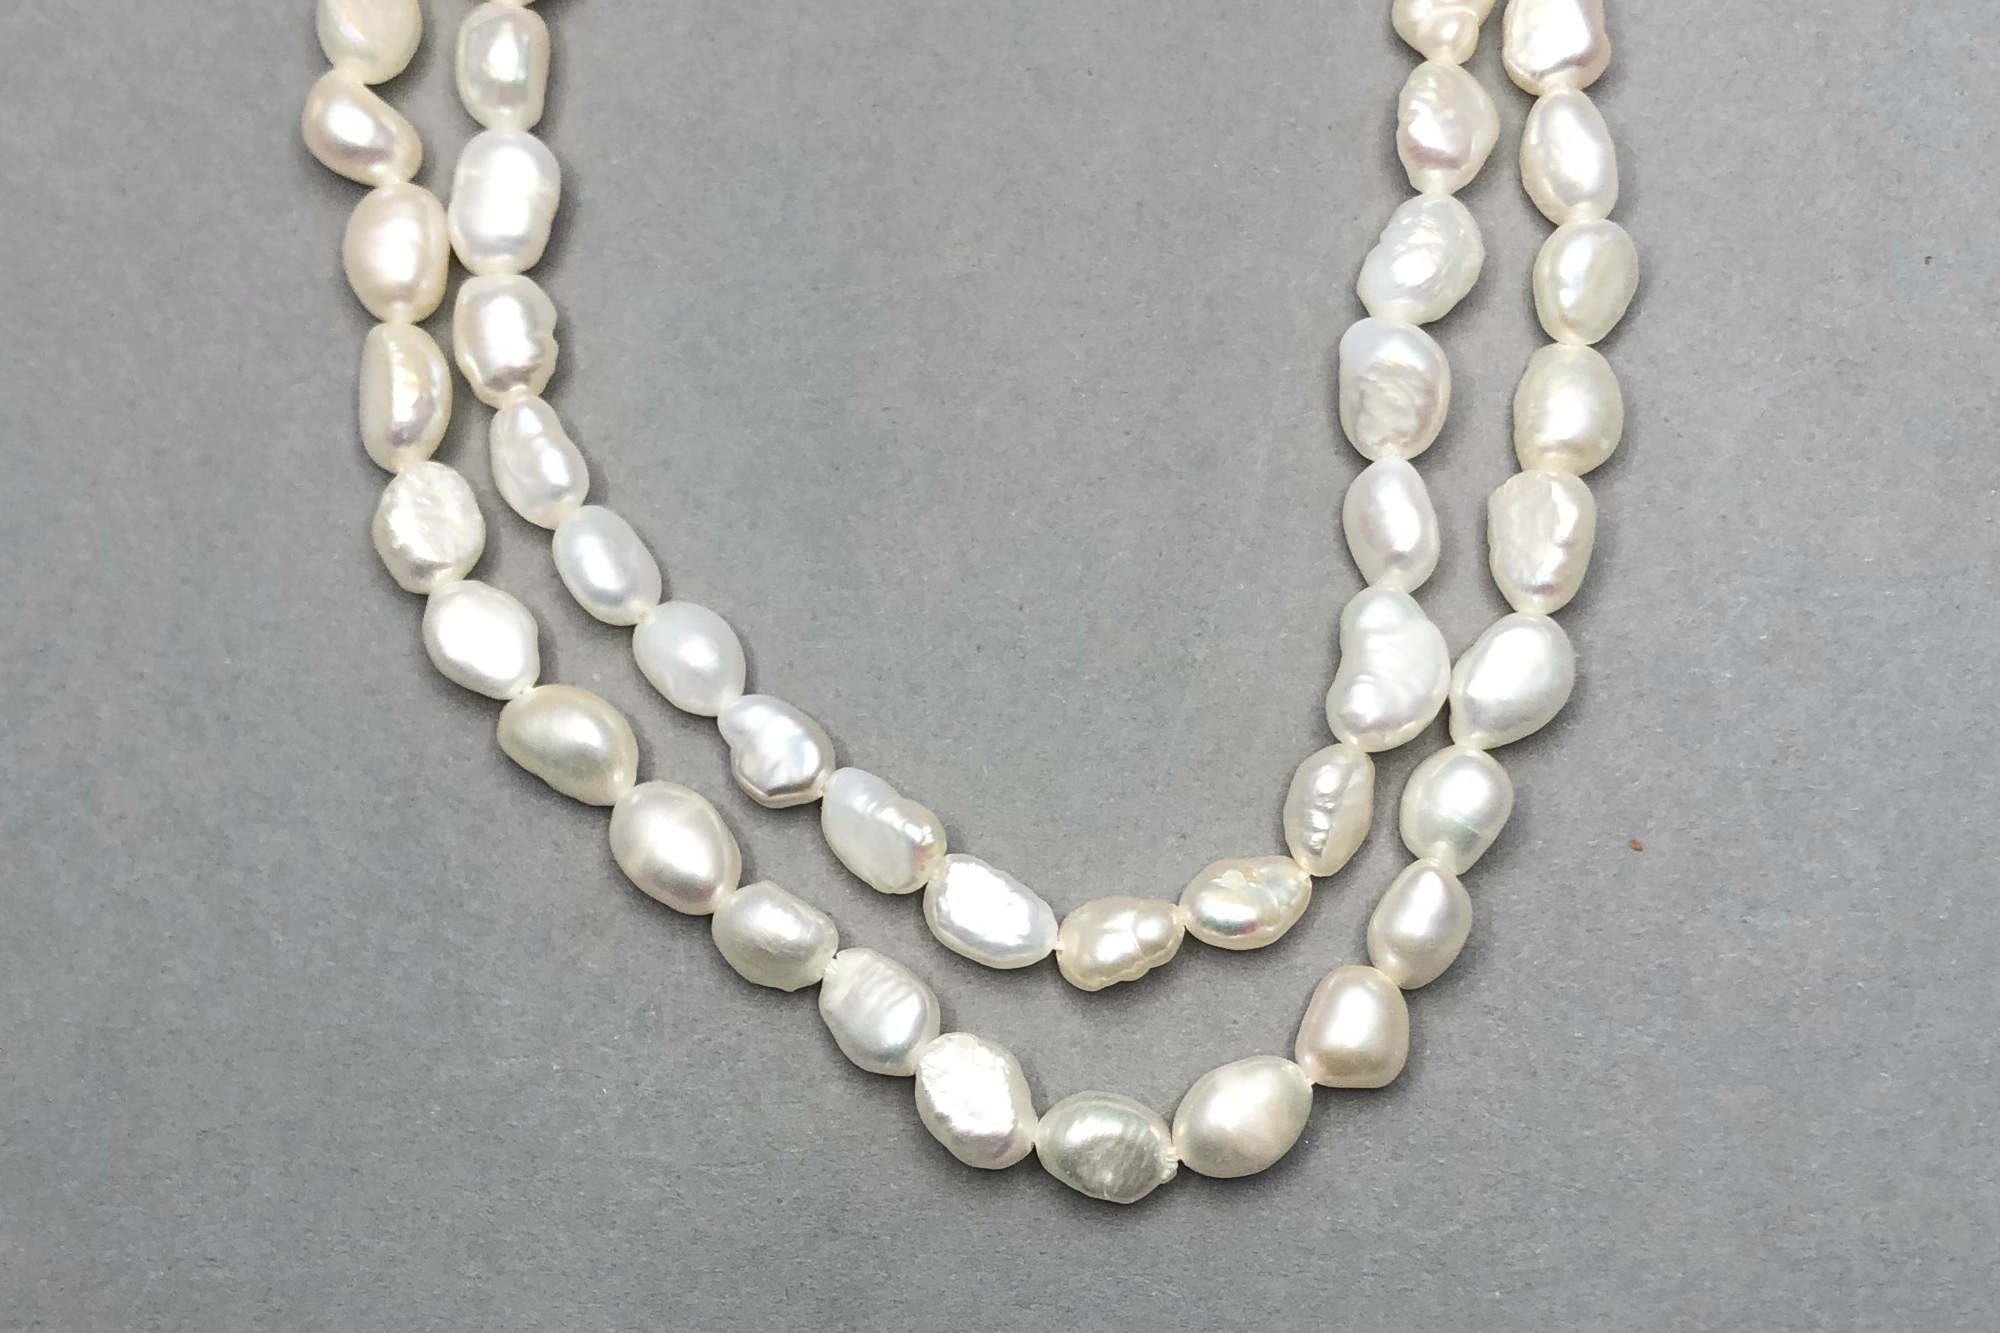 Natural Ivory Fresh Water Pearls, approx 36cm Strand, Flattish